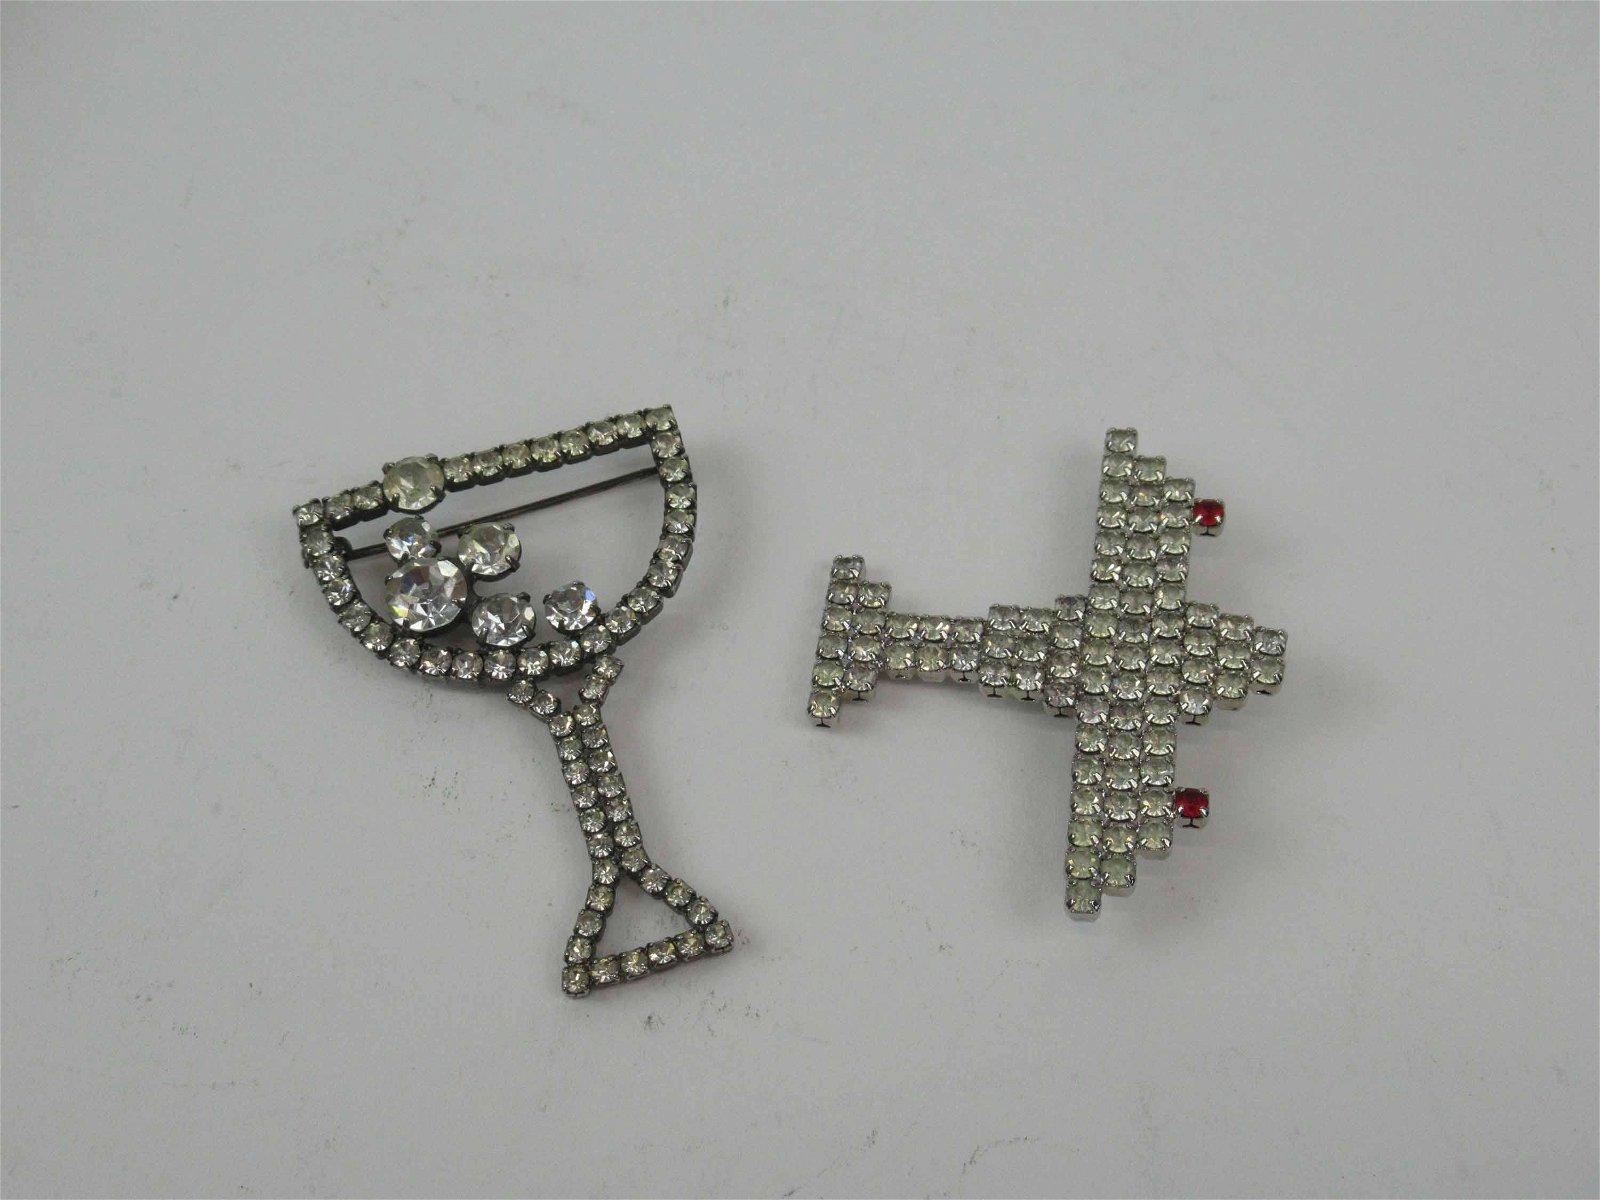 Two Vintage Dorothy Bauer Rhinestone Pins